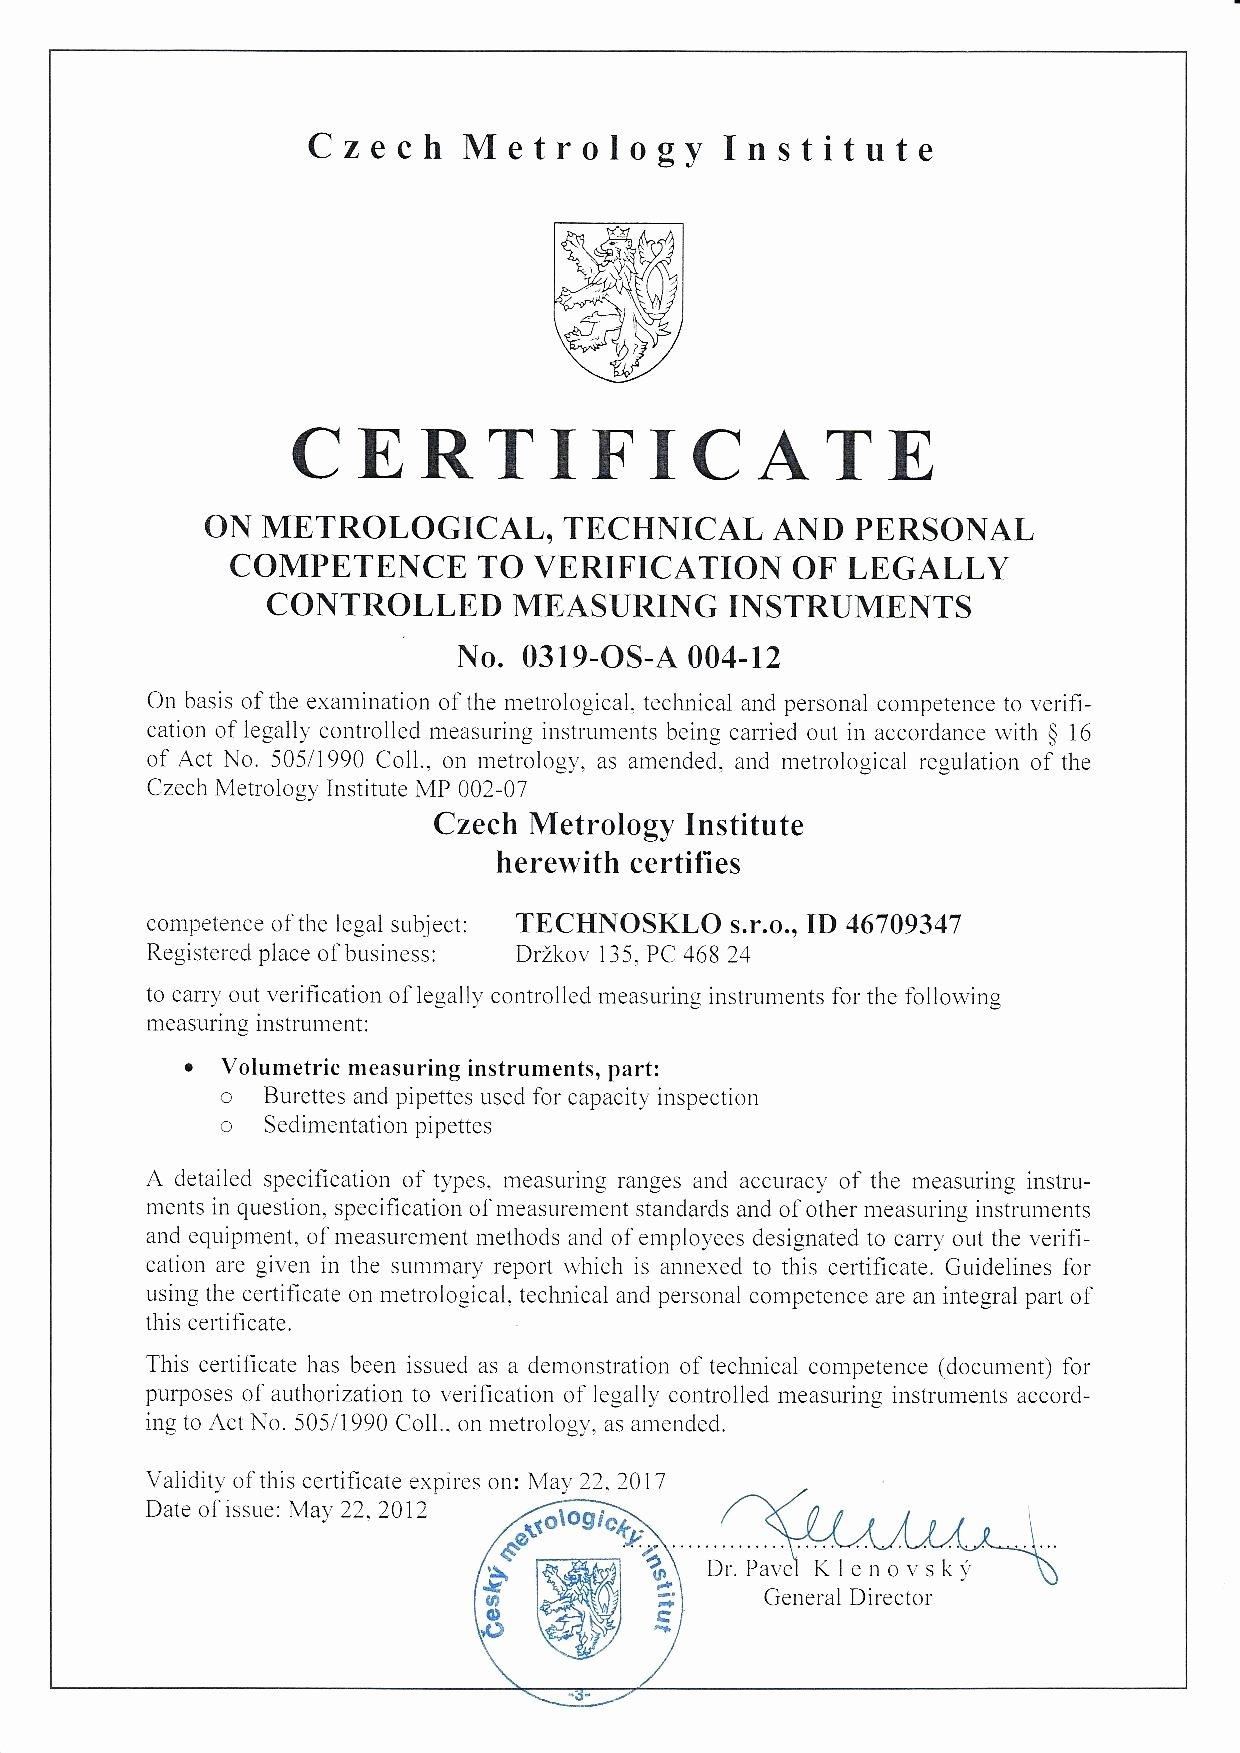 Hard Drive Destruction Certificate Template Lovely Hard Drive Certificate Destruction Template Certificate